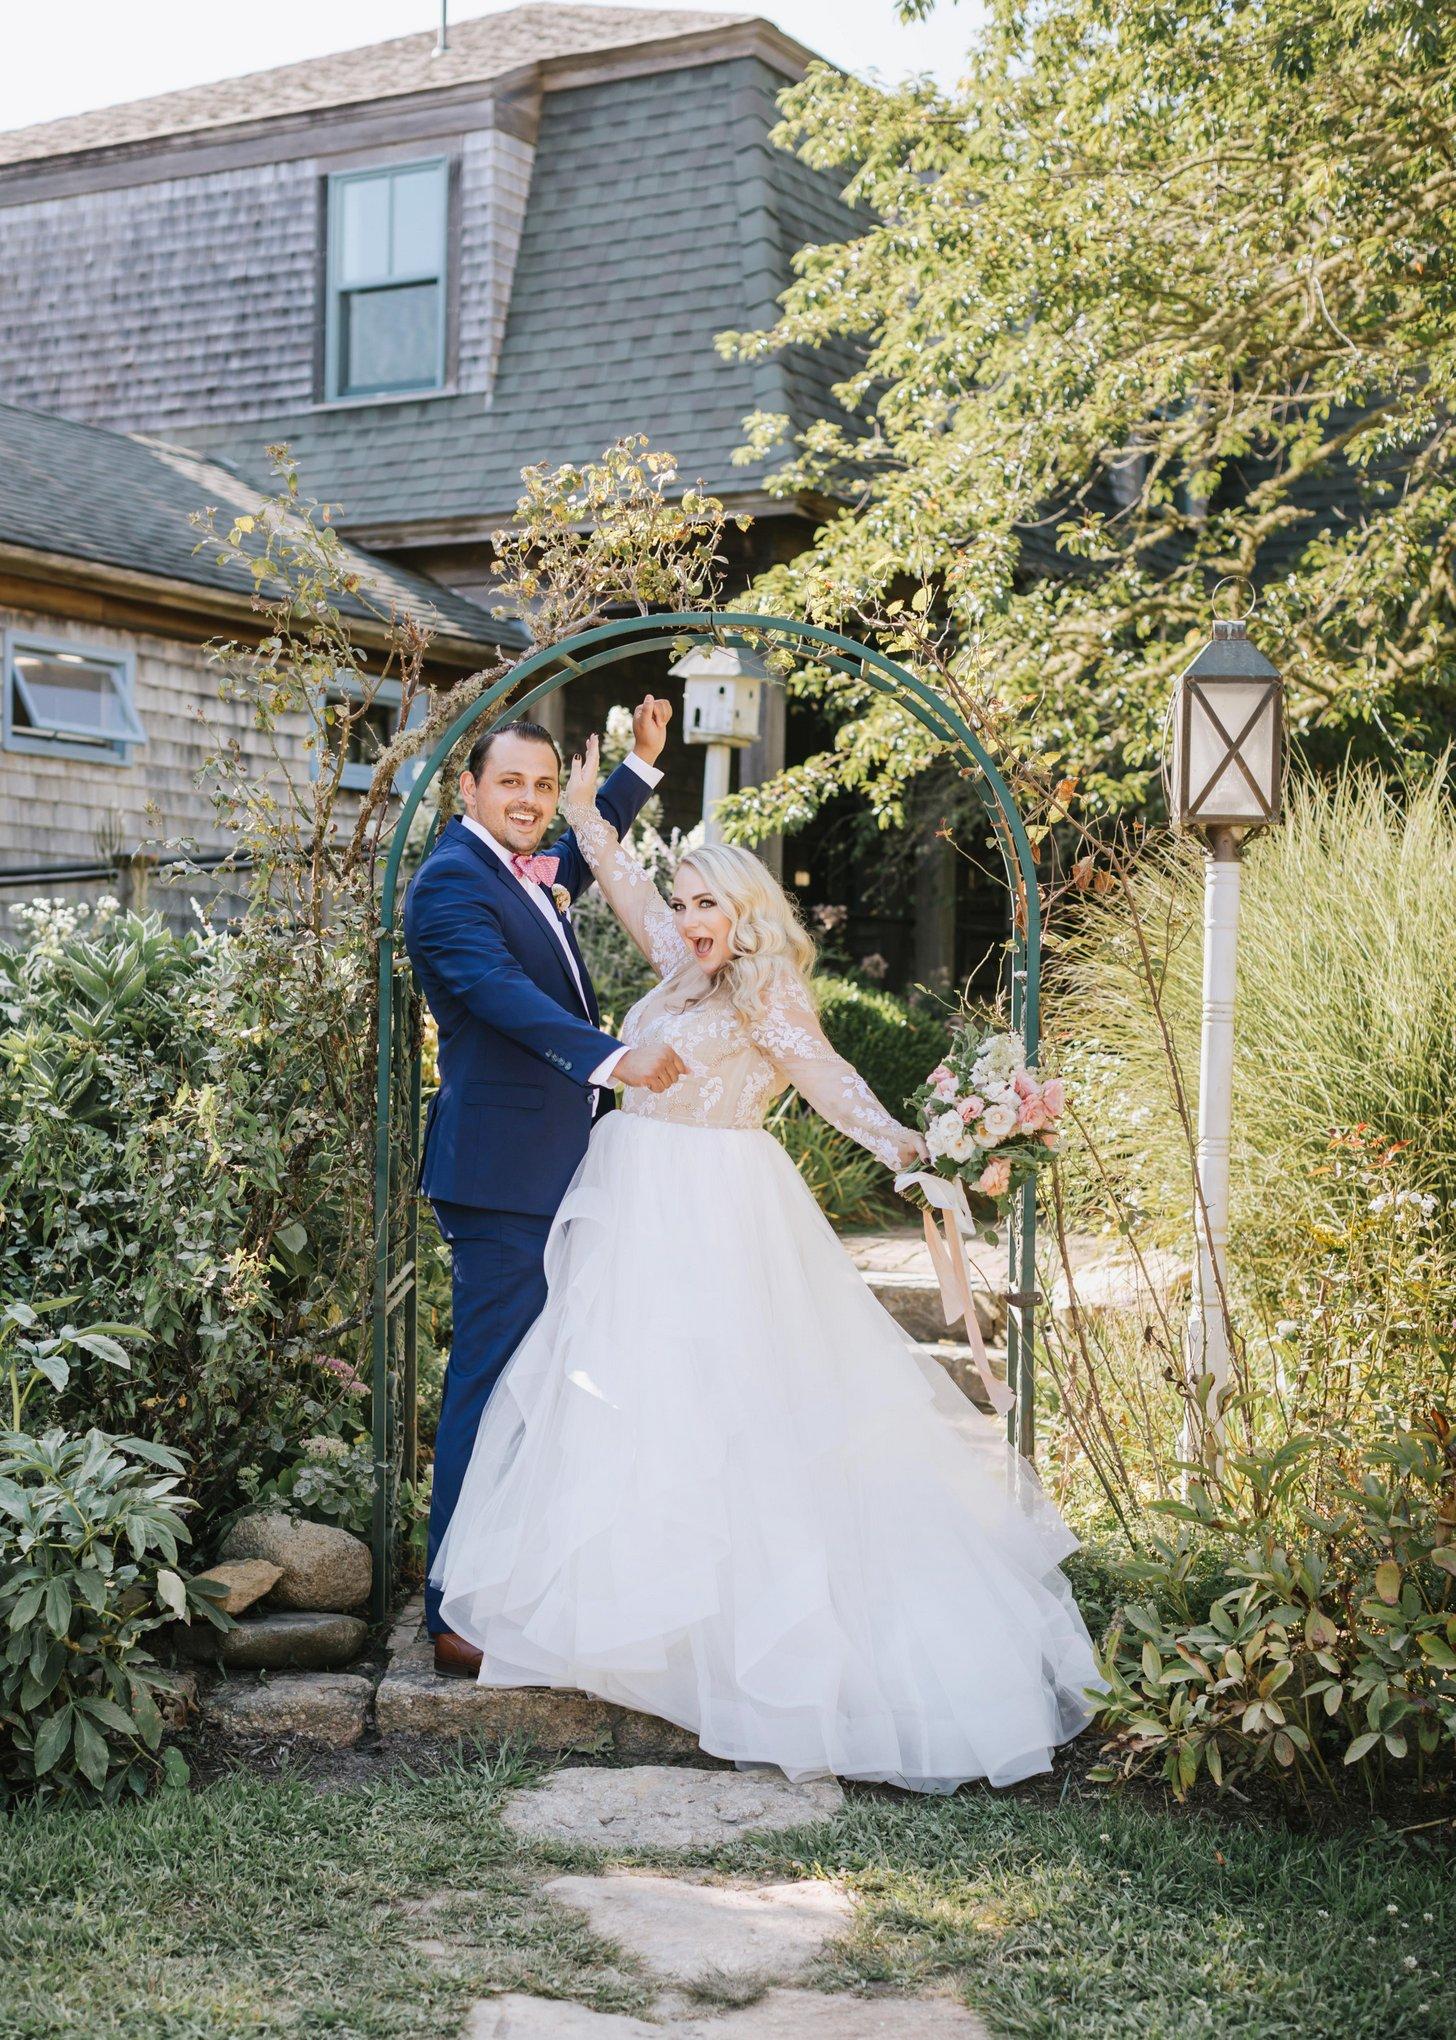 Marthas-Vineyard-Wedding-Photographer-Beach-Plum-Inn-26.jpg